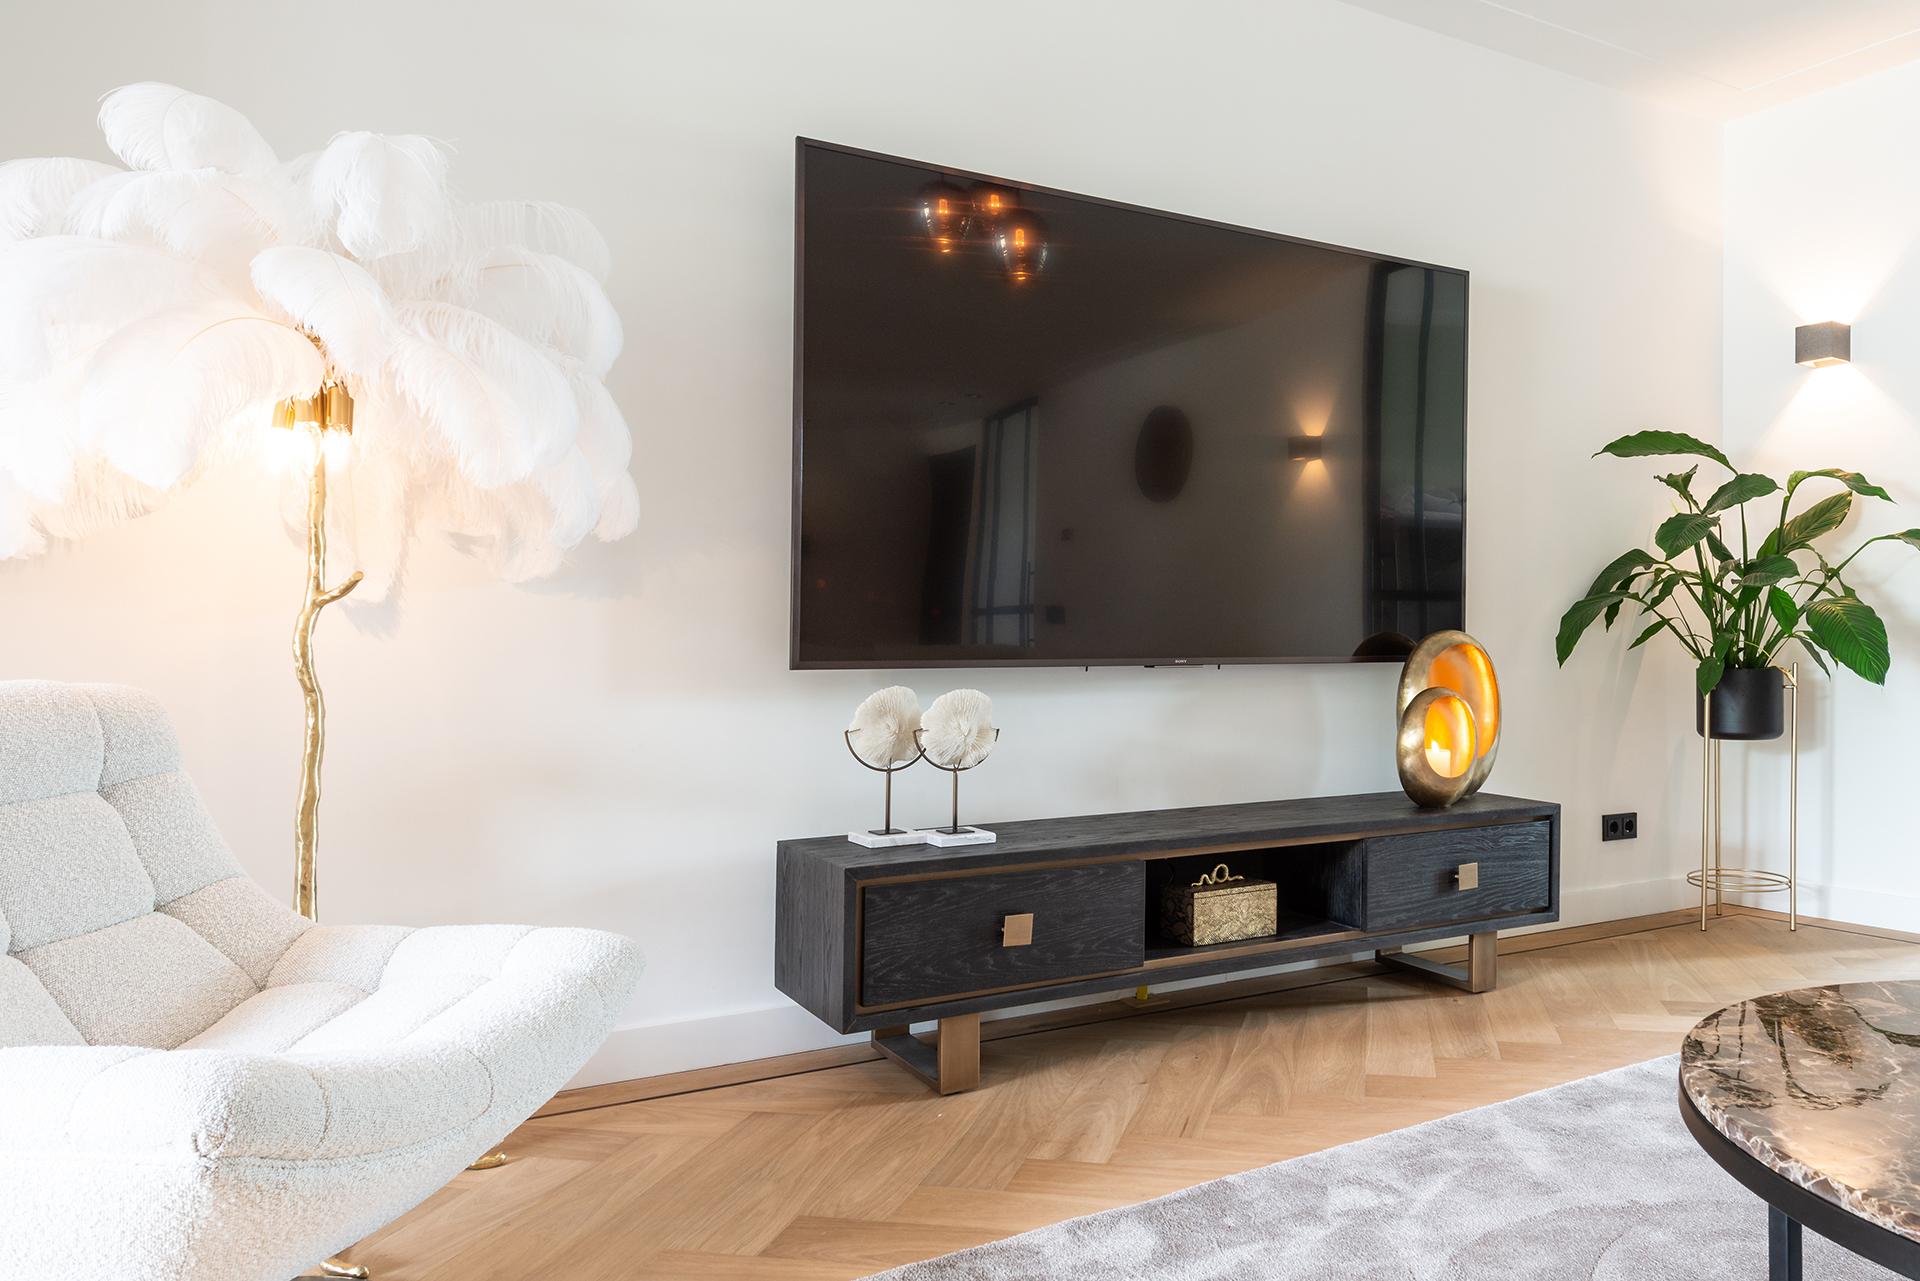 Richmond Interiors | Butter 17 | 1713 GM Obdam | +31 226 451635 | www.richmondnteriors.nl | sales@richmondinteriors.nl